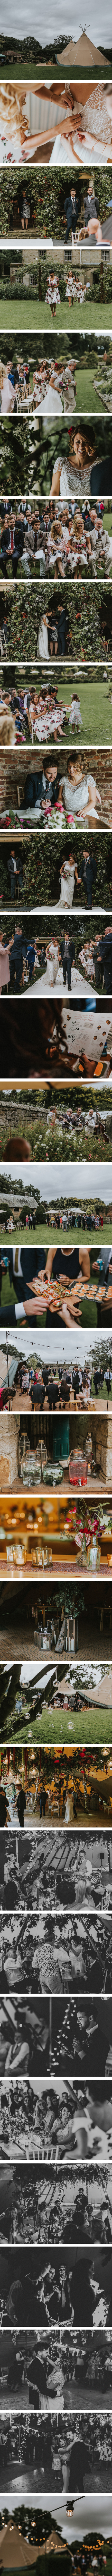 Amy & Darren's PapaKåta Teepee Wedding